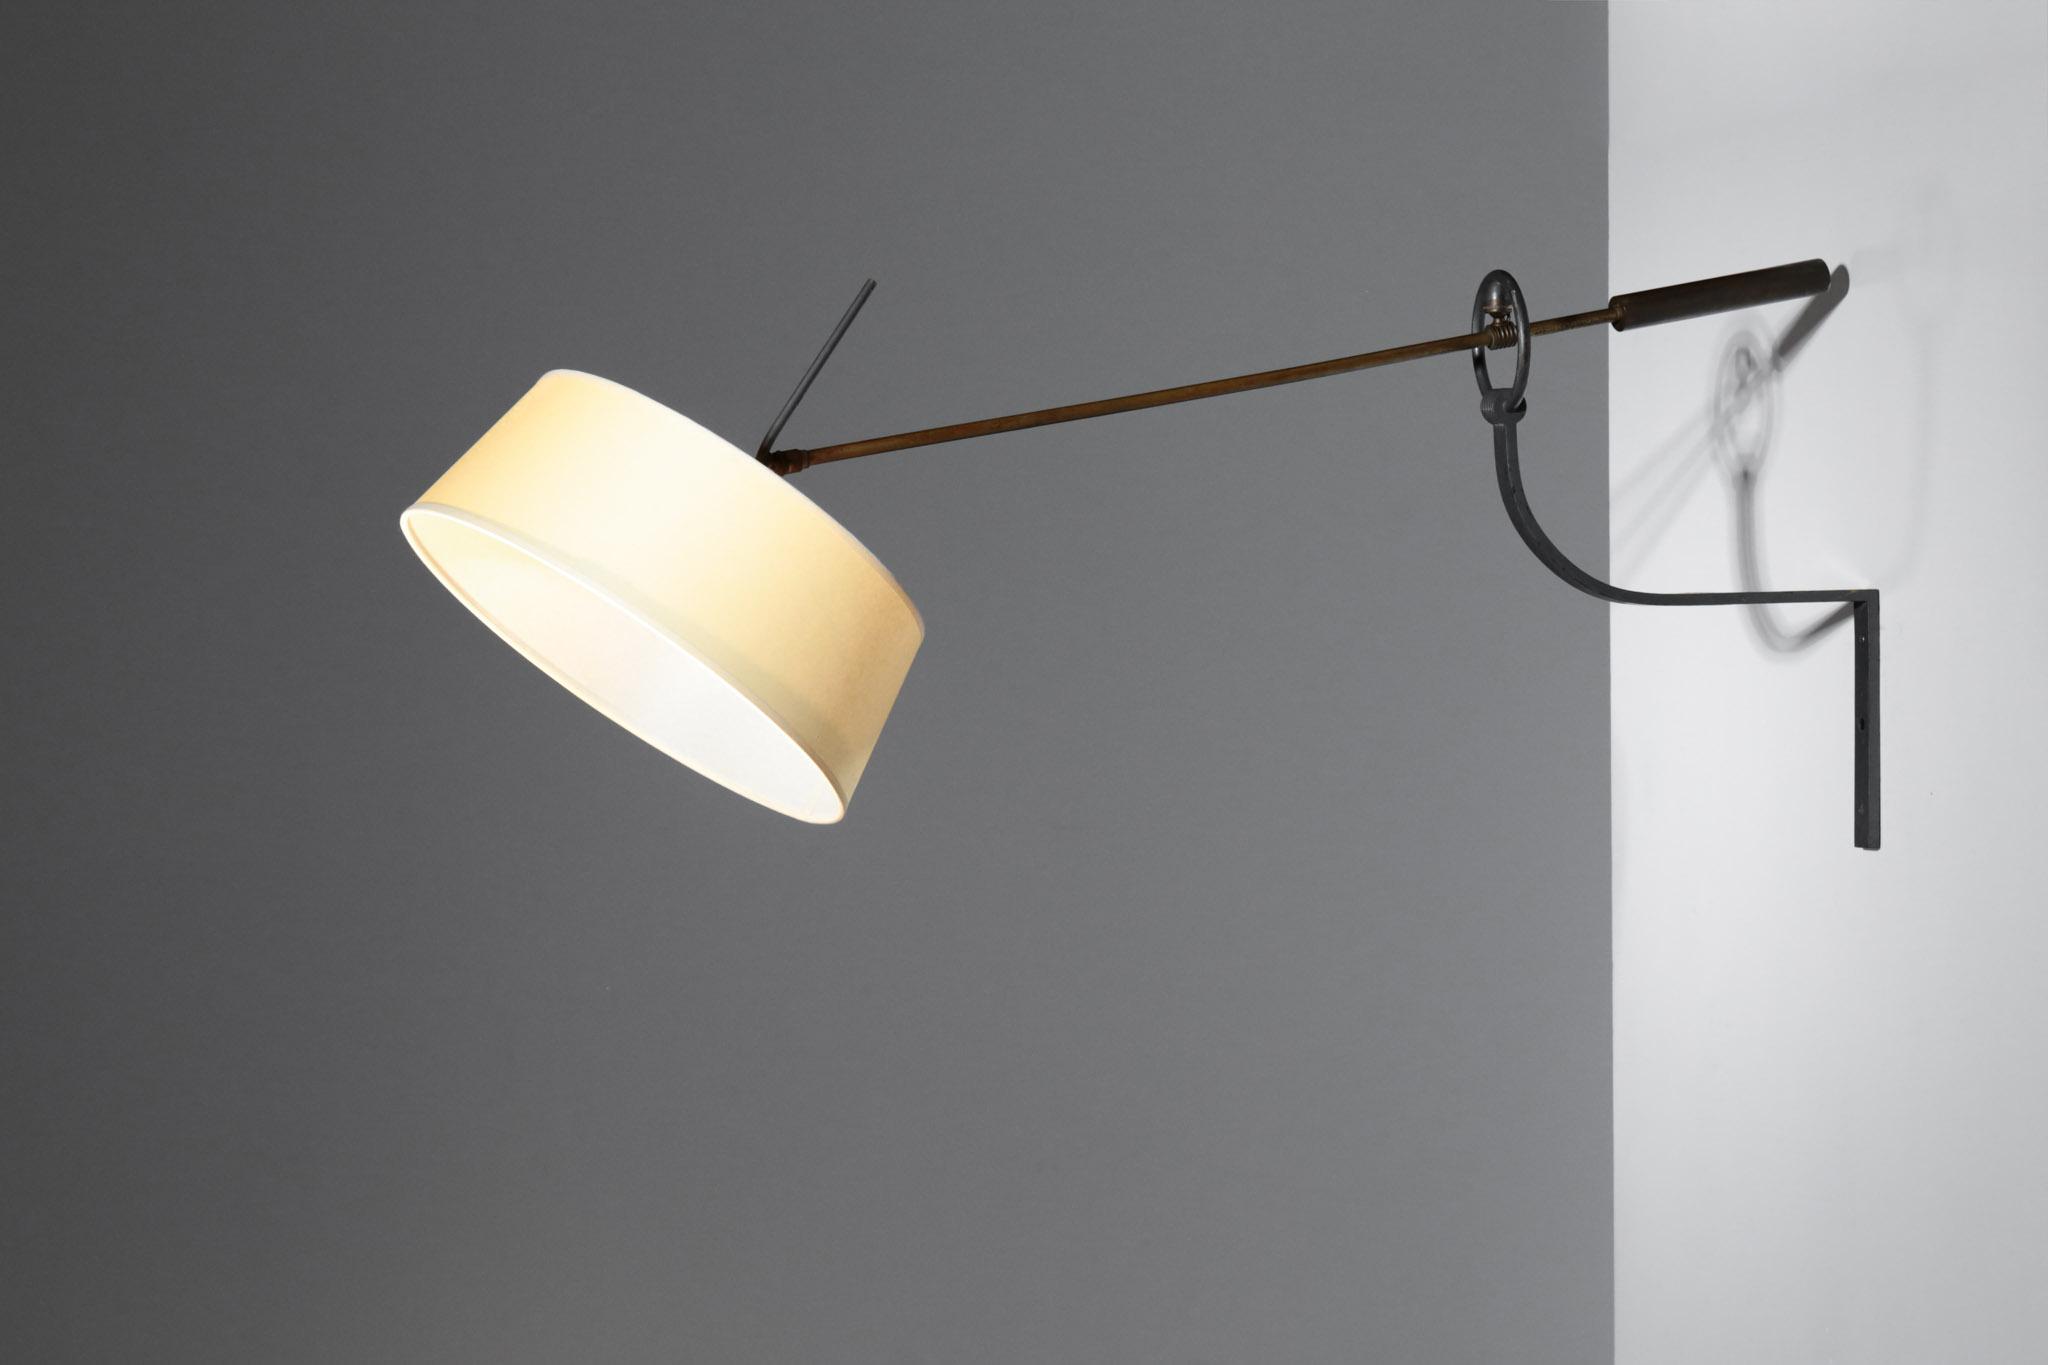 Large counter balance wall lamp attributed to arlus france u2013 danke